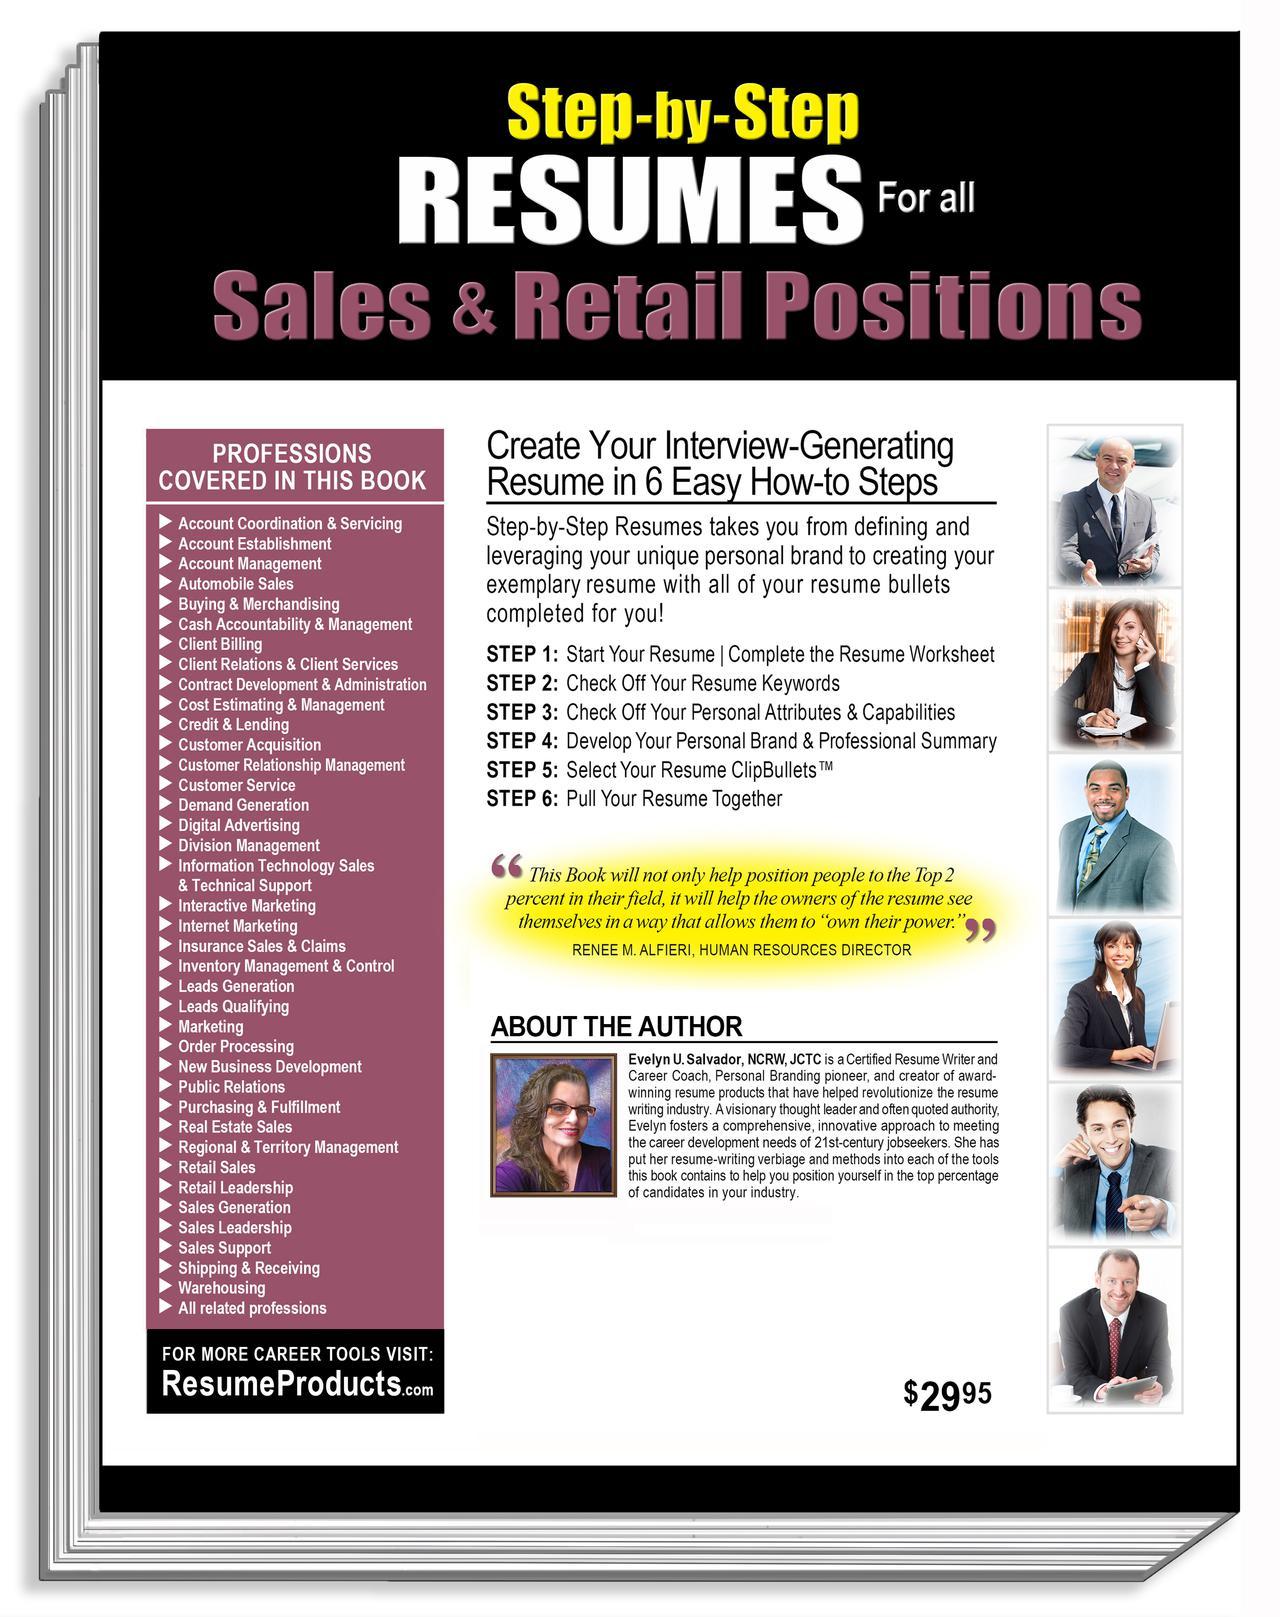 sales & retail bc.jpg